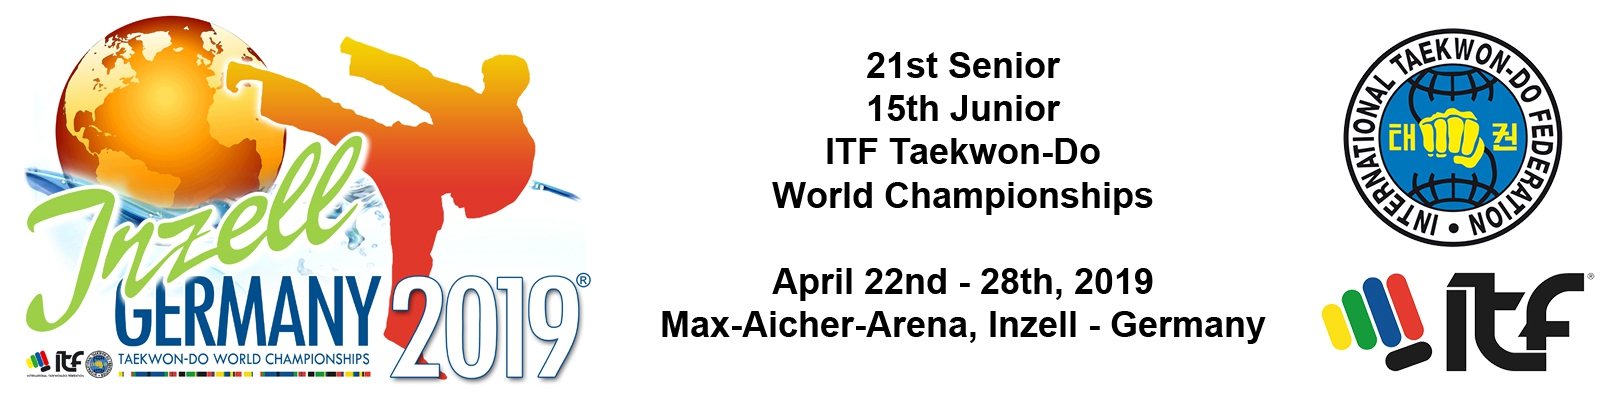 Calendario Itf.Itf 21st Senior 15th Junior Itf Taekwon Do World